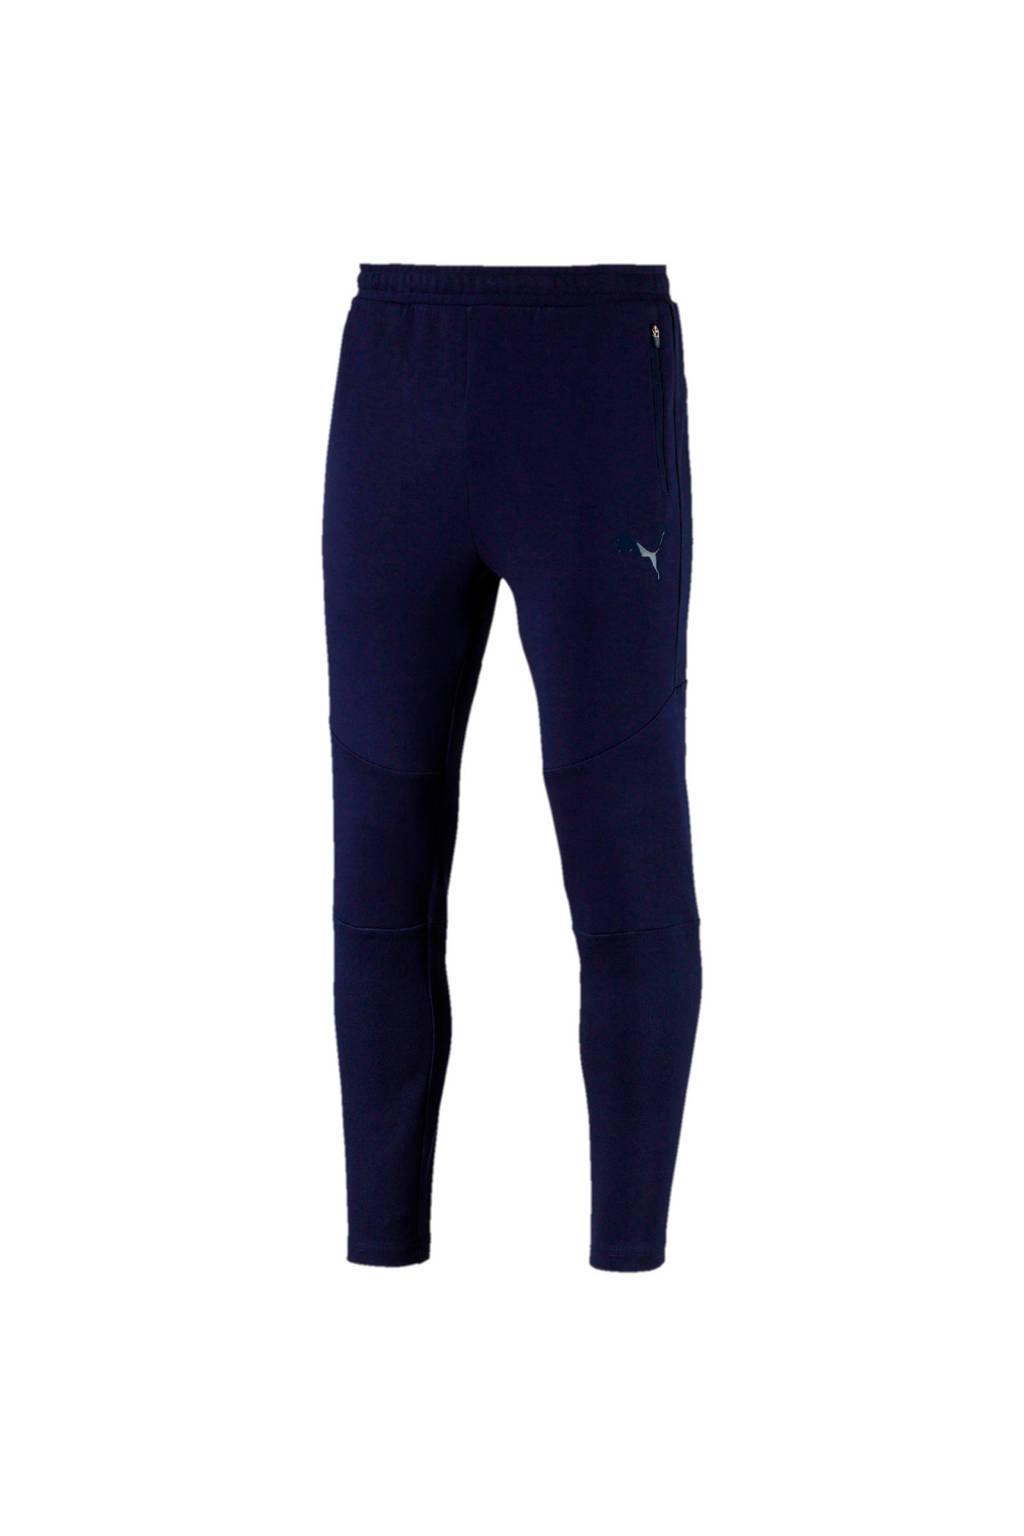 Puma joggingbroek donkerblauw, Donkerblauw